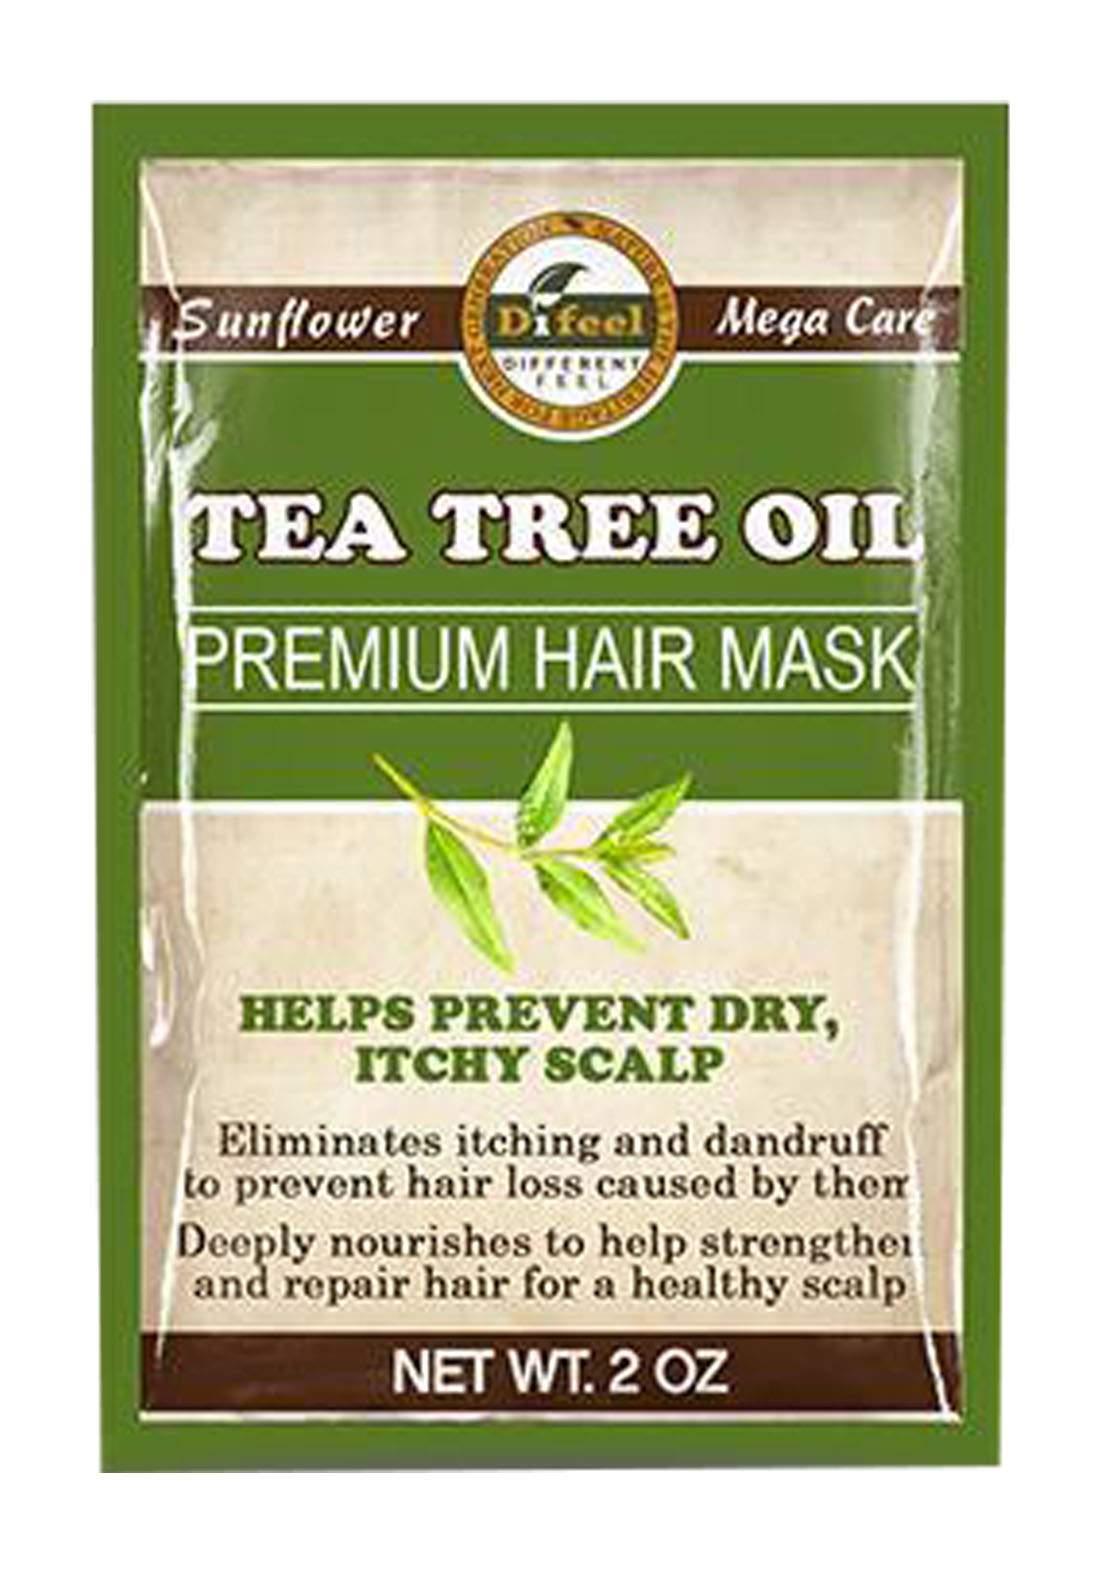 Difeel SH31_TEA18 Sunflower Premium Hair Mask Tea Tree Oil 50g  قناع للشعر